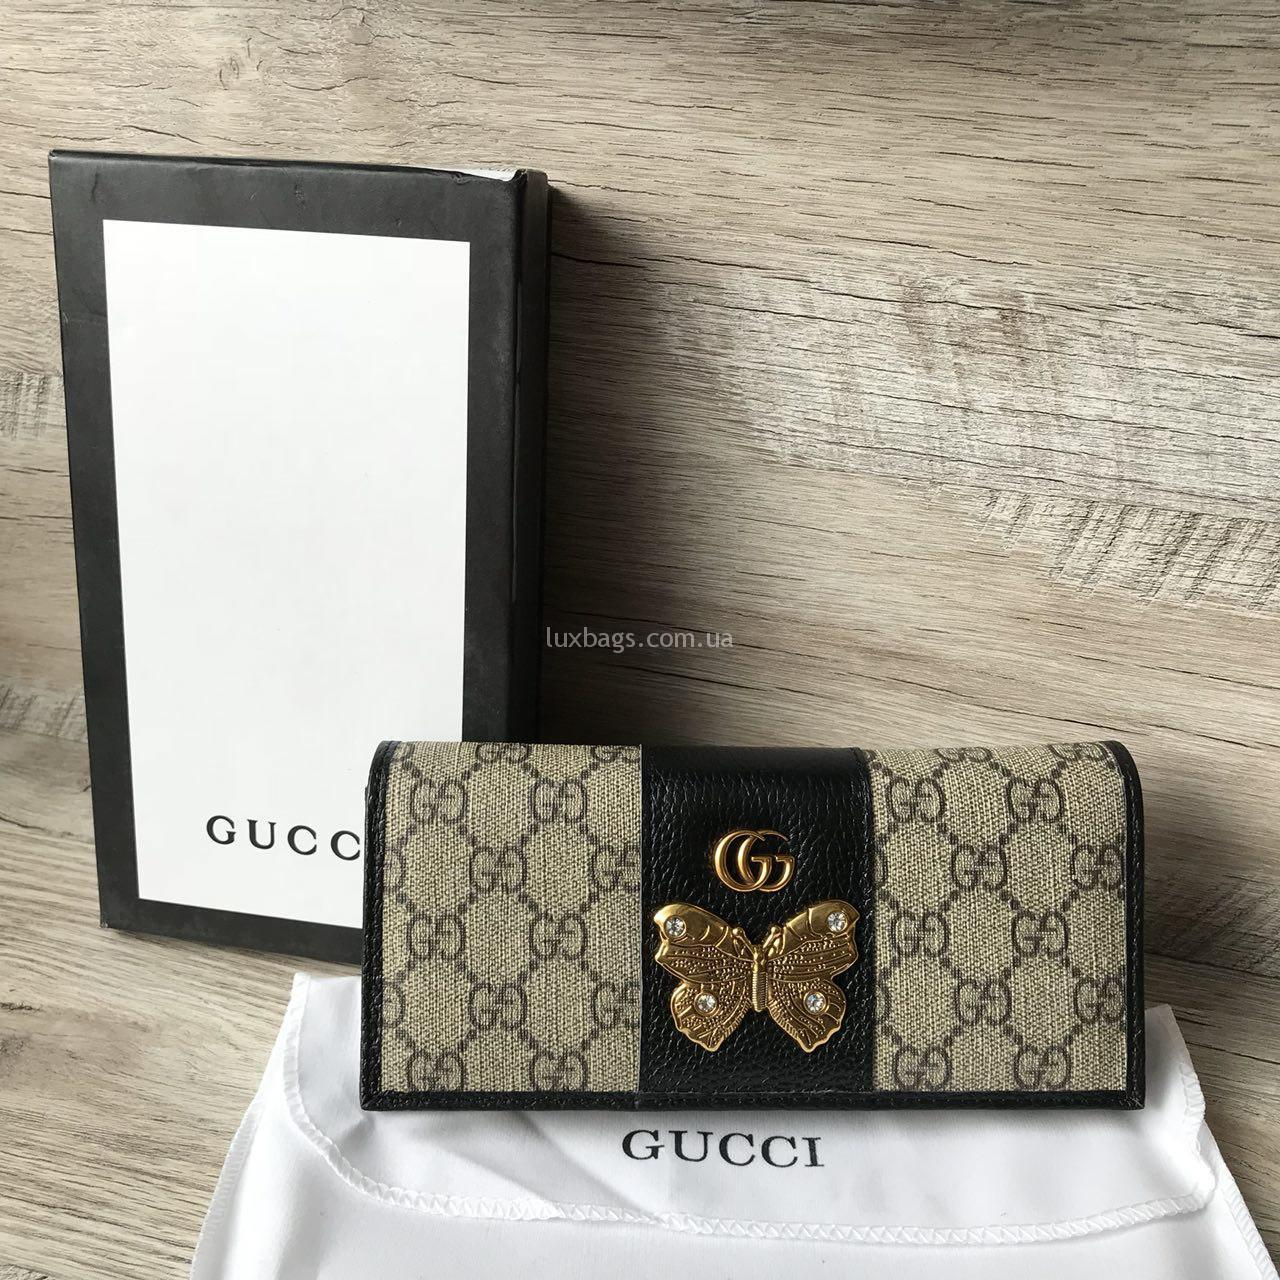 b2068c2585db Кошелёк Gucci (Гуччи) с бабочкой Купить на lux-bags